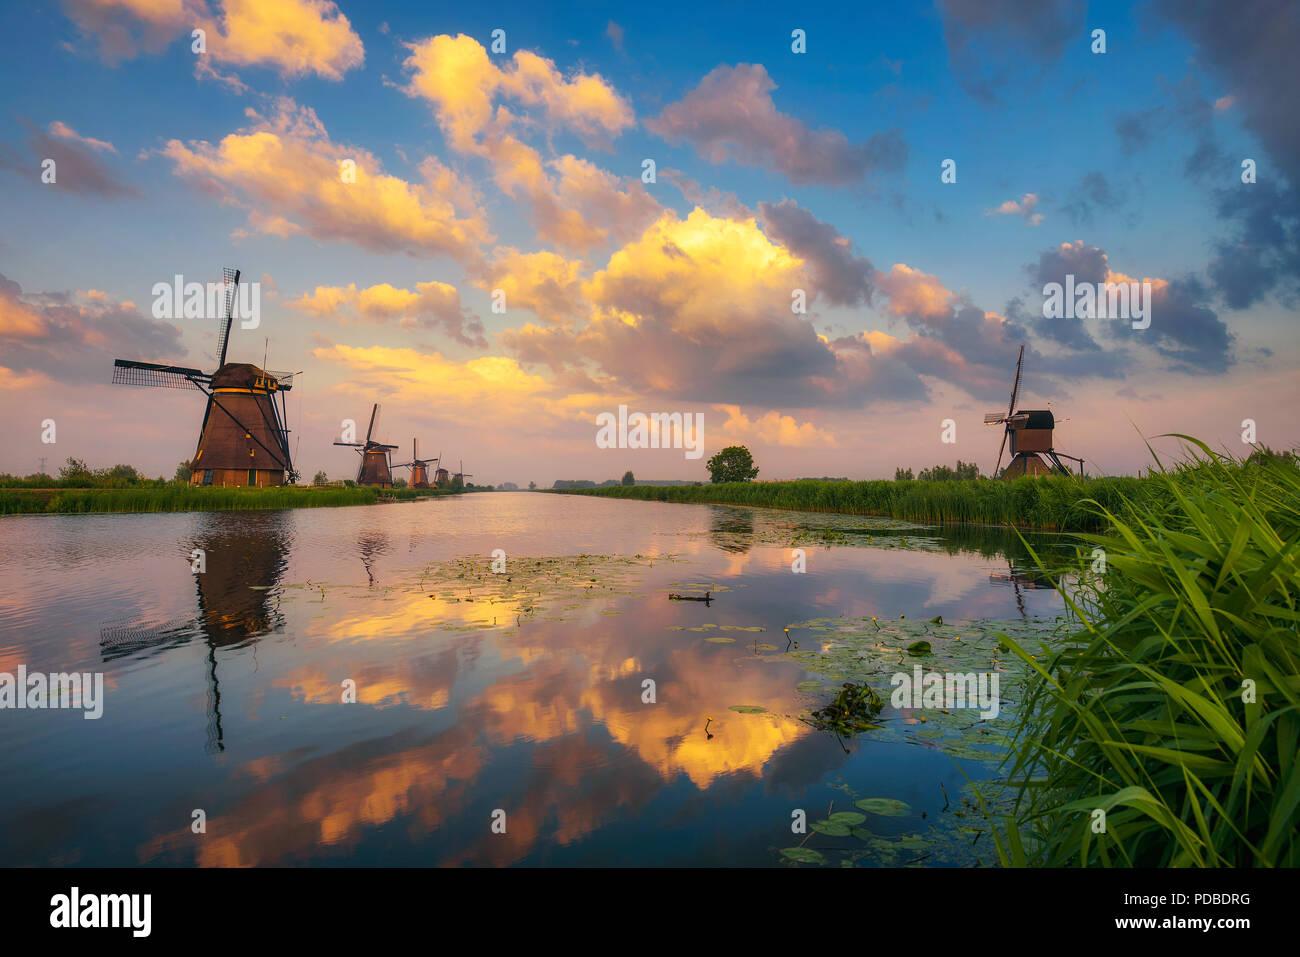 Sunset above old dutch windmills in Kinderdijk, Netherlands - Stock Image